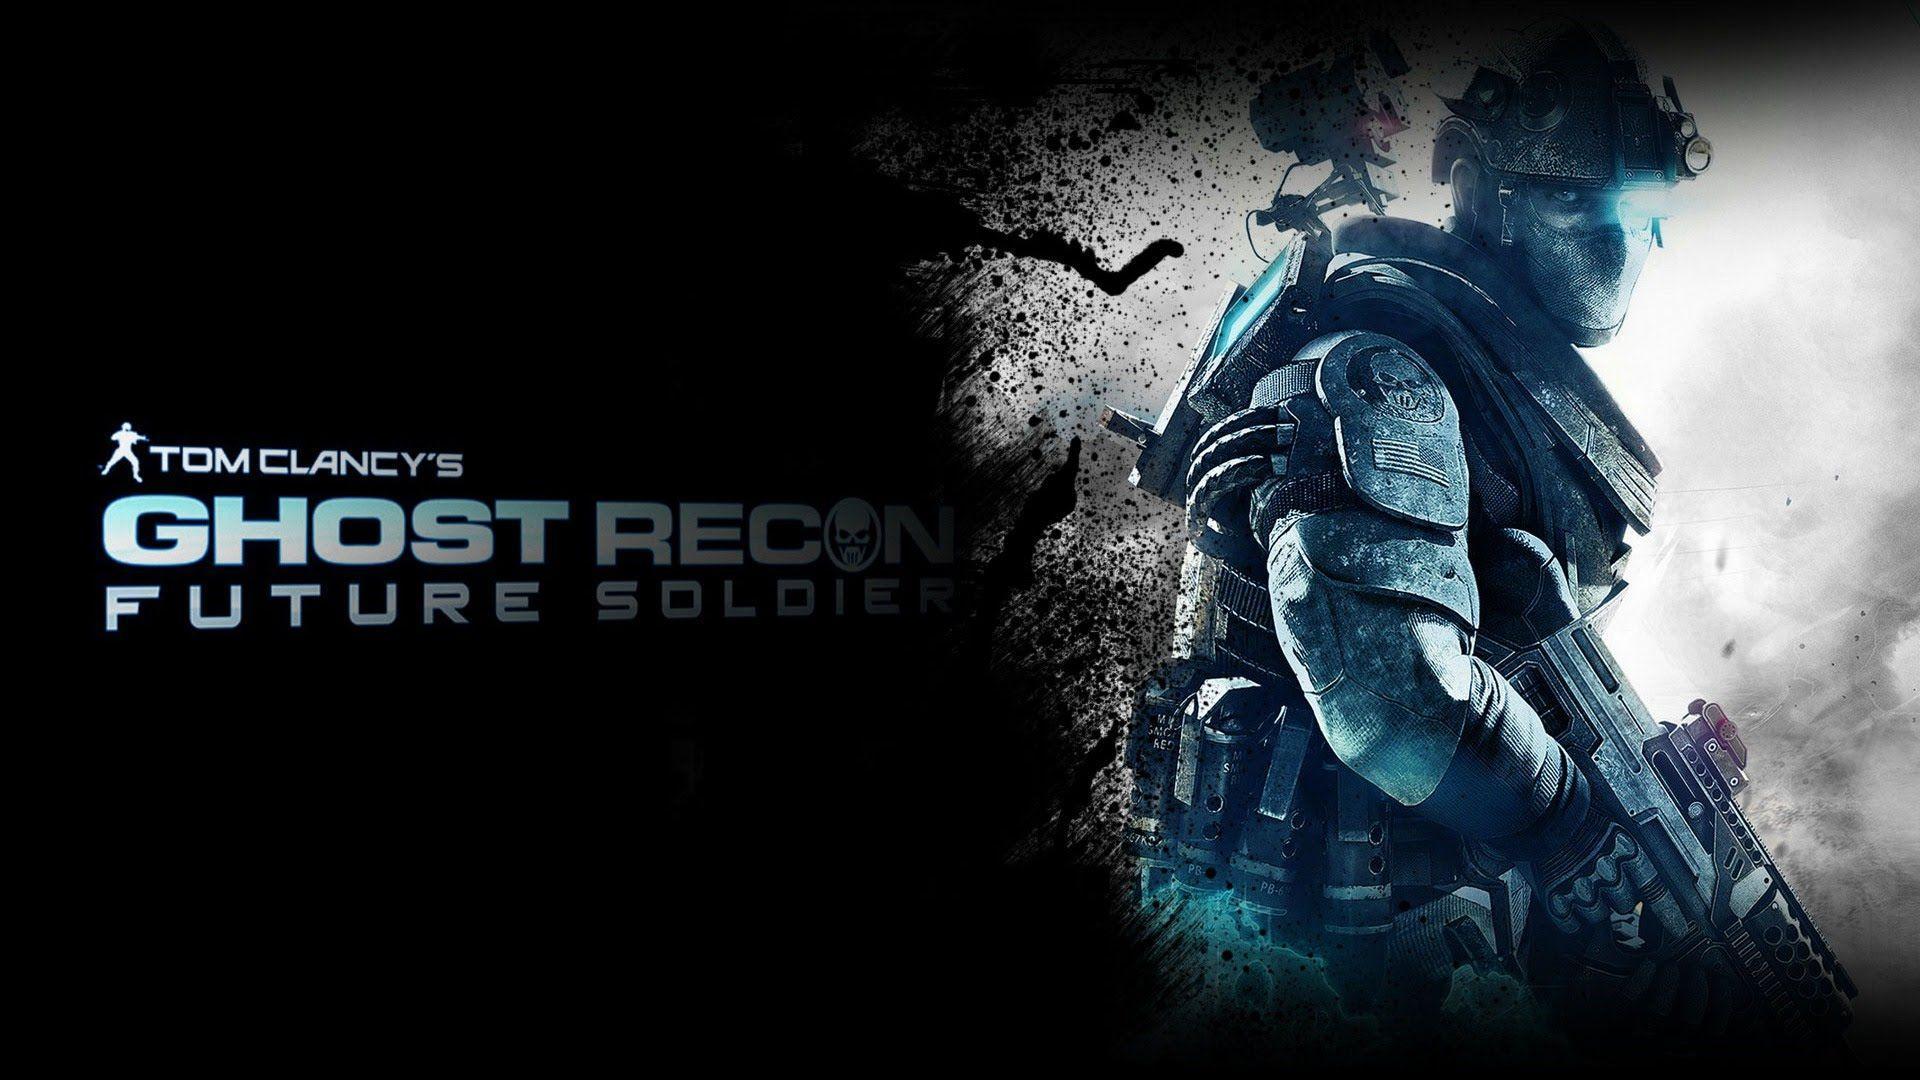 download ghost recon future soldier pc